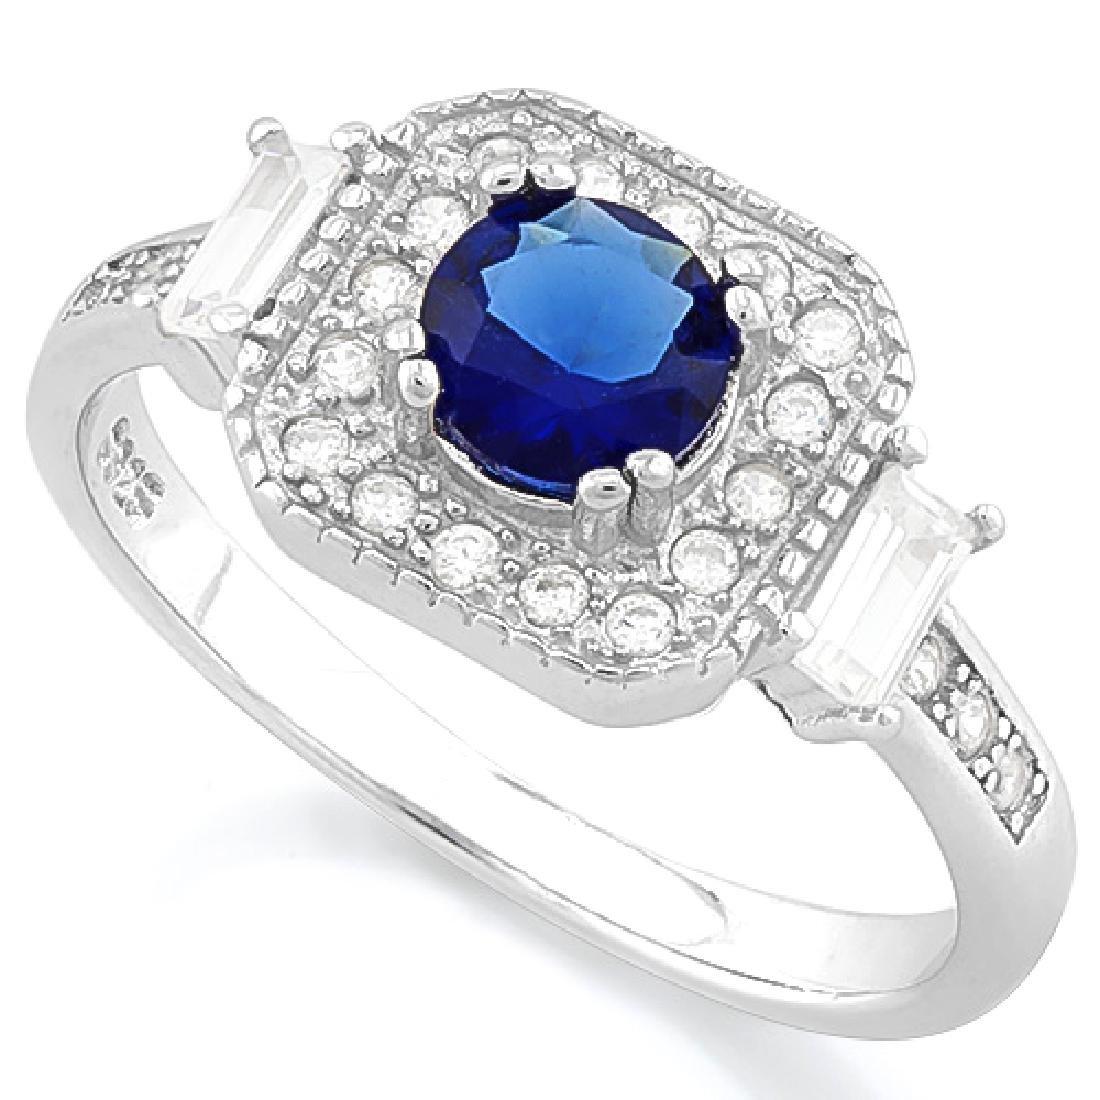 3/5 CARAT CREATED BLUE SAPPHIRE & 1/4 CARAT (24 PCS) FL